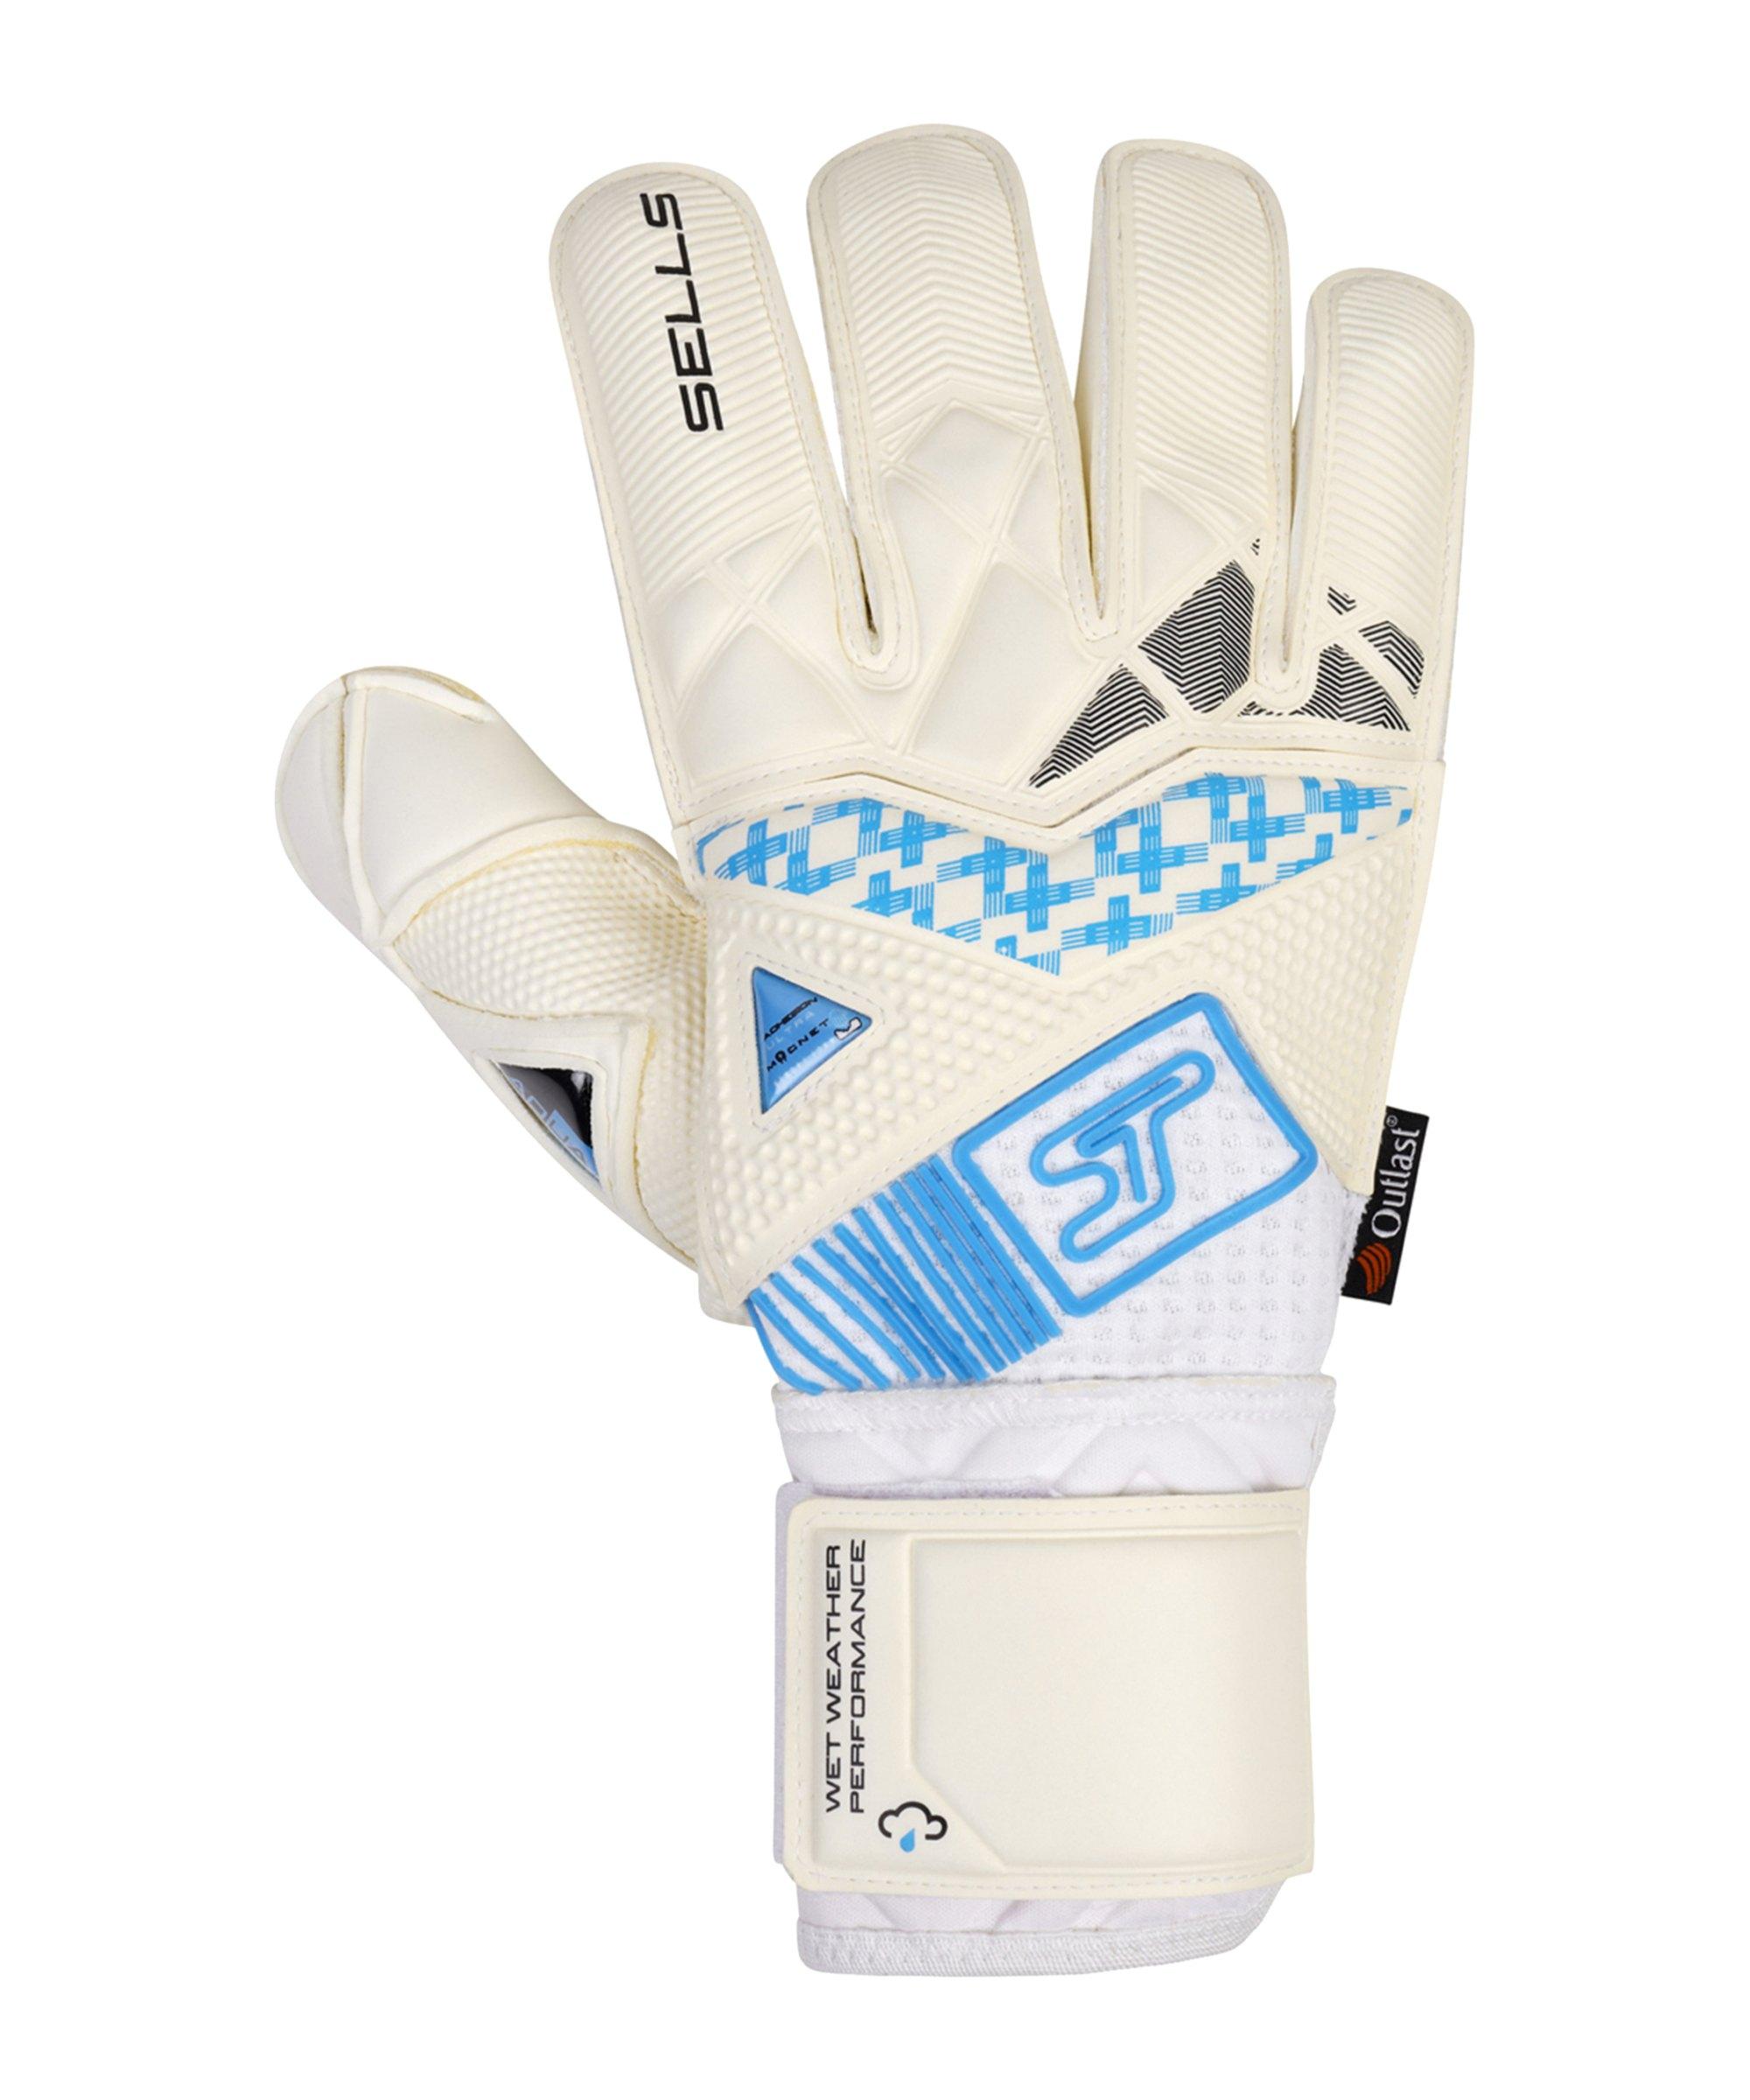 Sells Wrap Ultimate TW-Handschuh Weiss Schwarz Blau - weiss